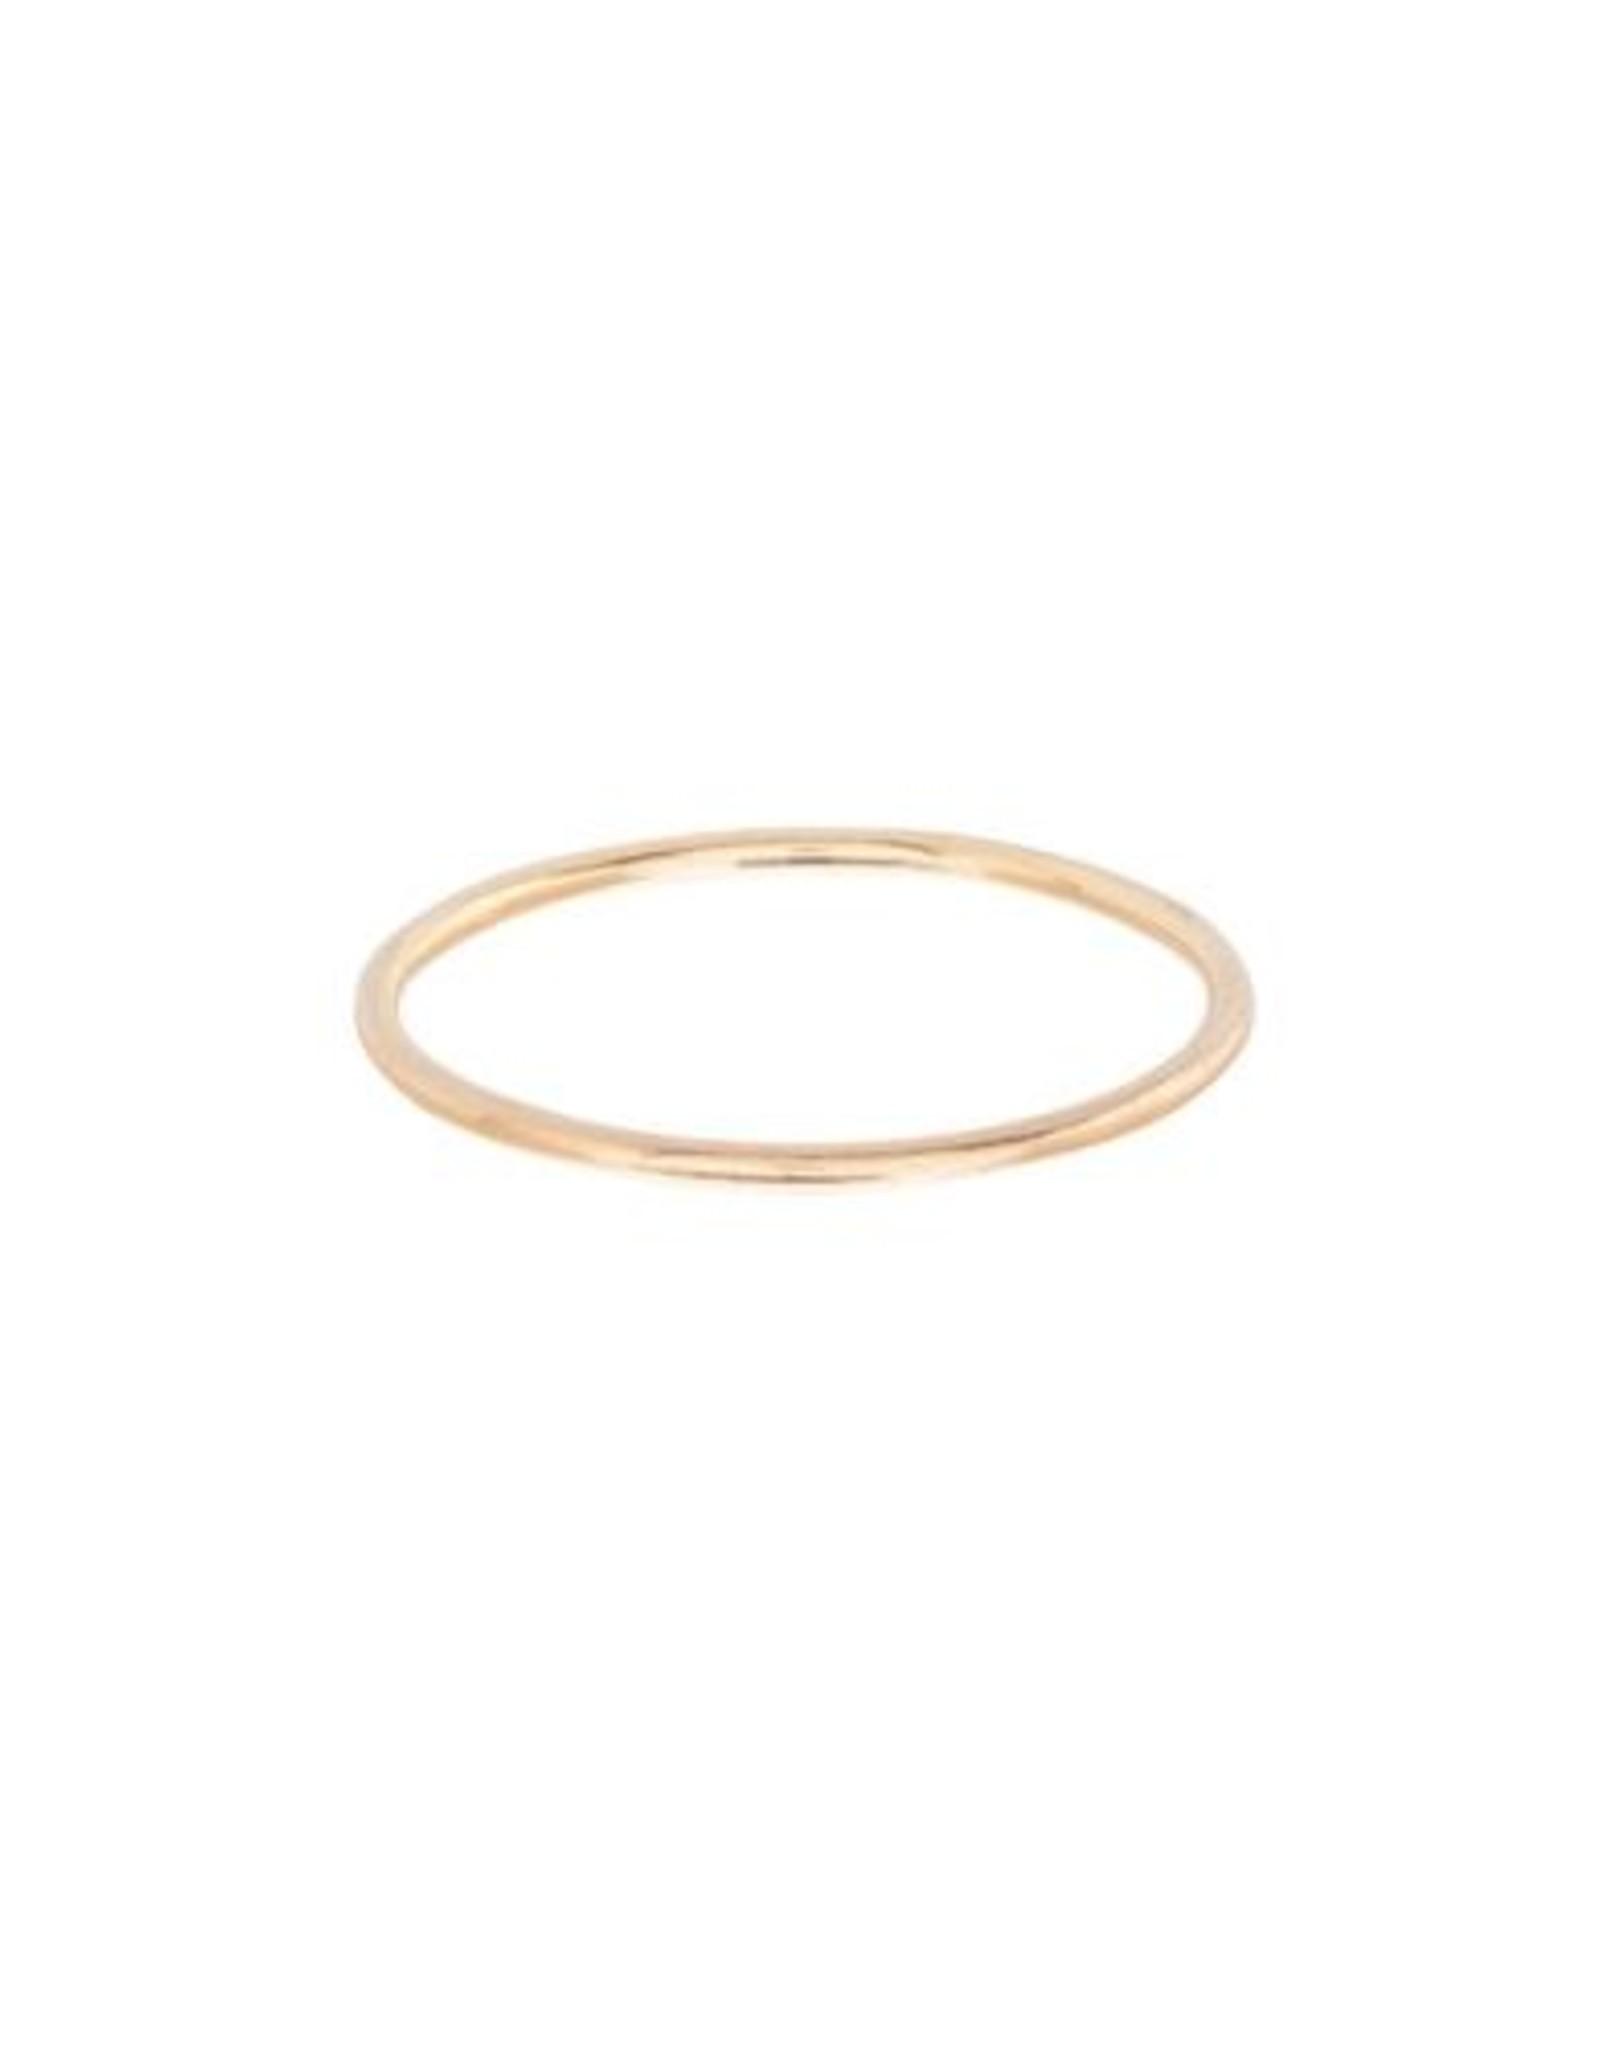 ENewton Design ENewton Designs- Classic Gold Thin Band Ring